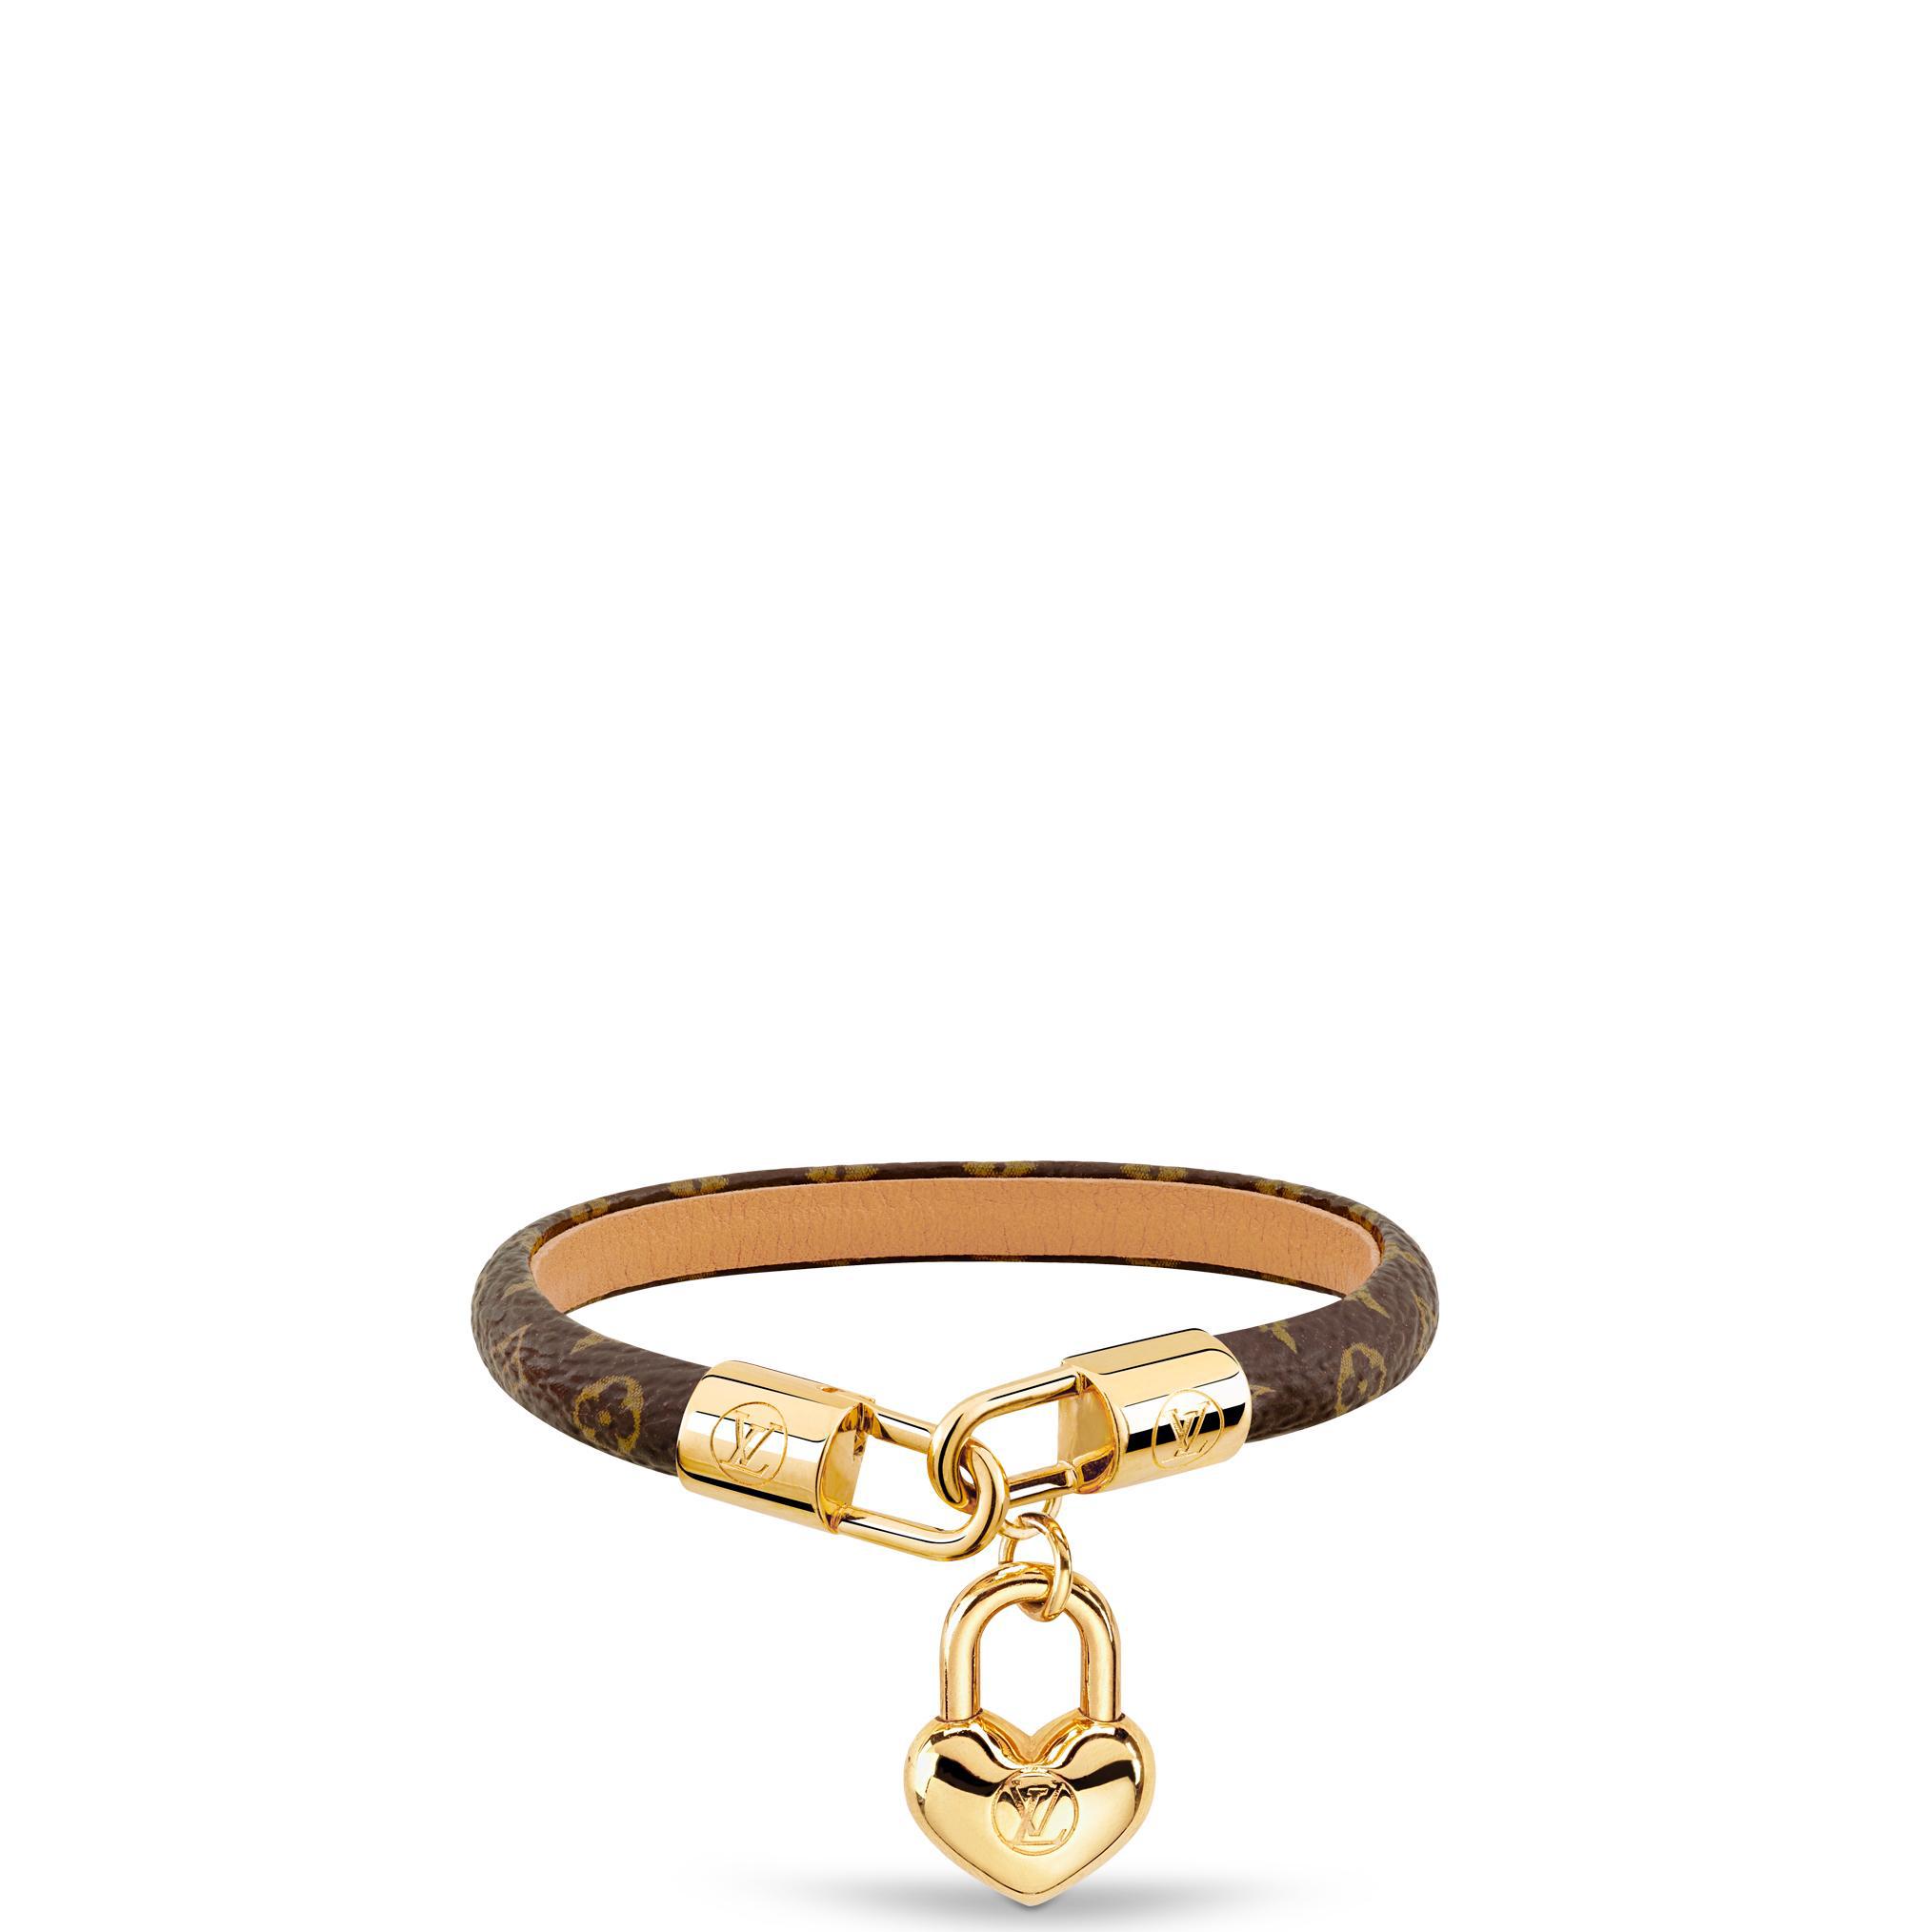 948b8b5314953 Louis Vuitton Crazy In Lock Bracelet